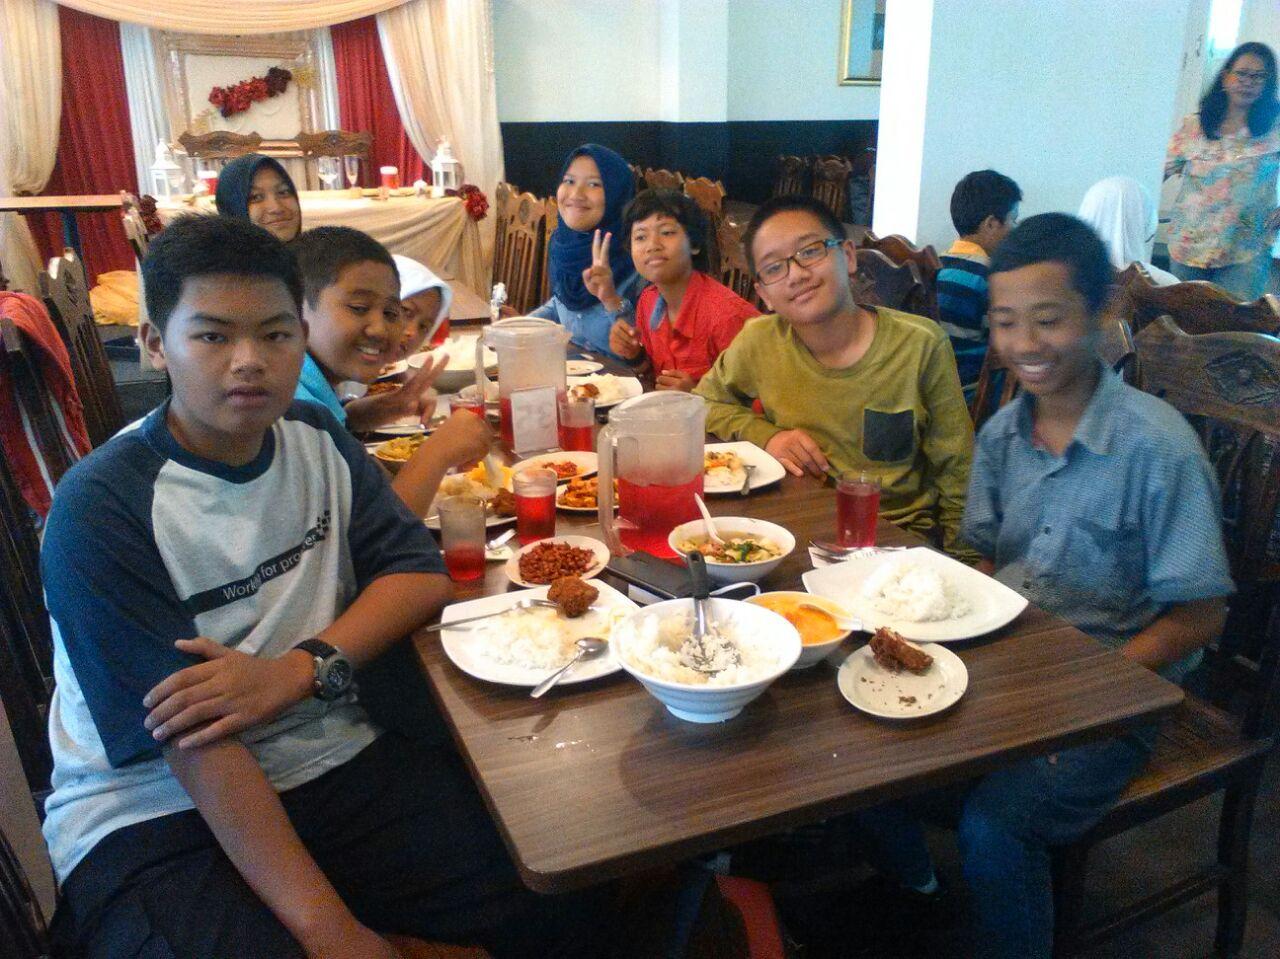 wisata singapura malaysia 2016 (8)